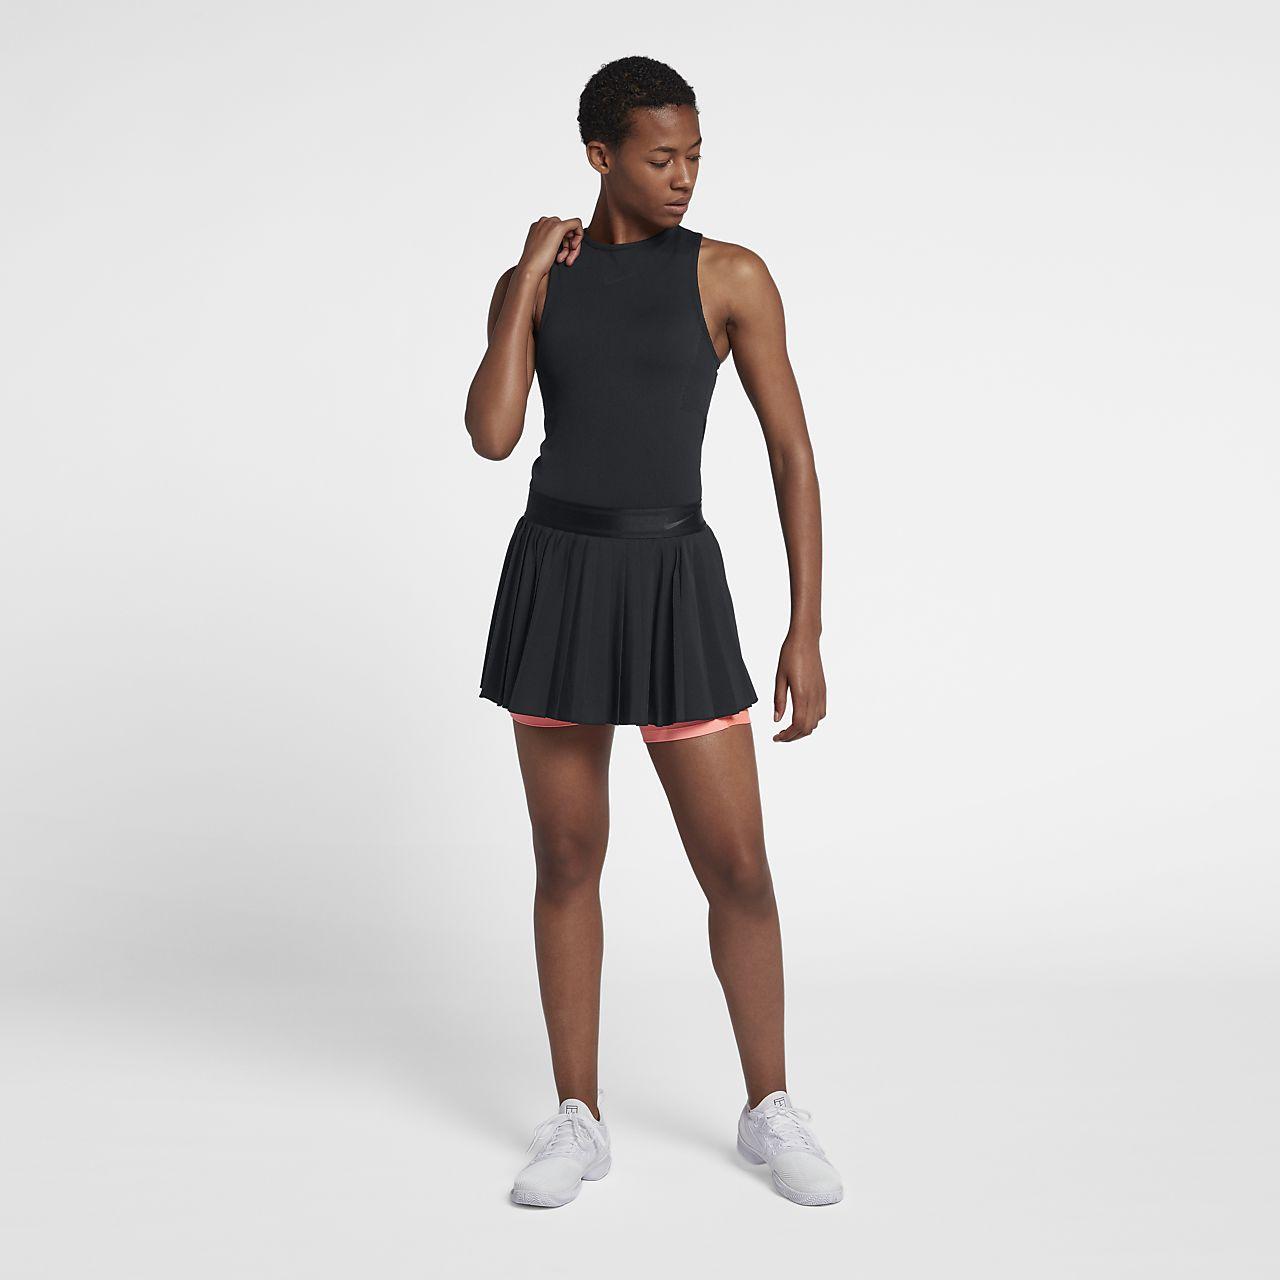 305283a5c NikeCourt Victory Women's Tennis Skirt. Nike.com